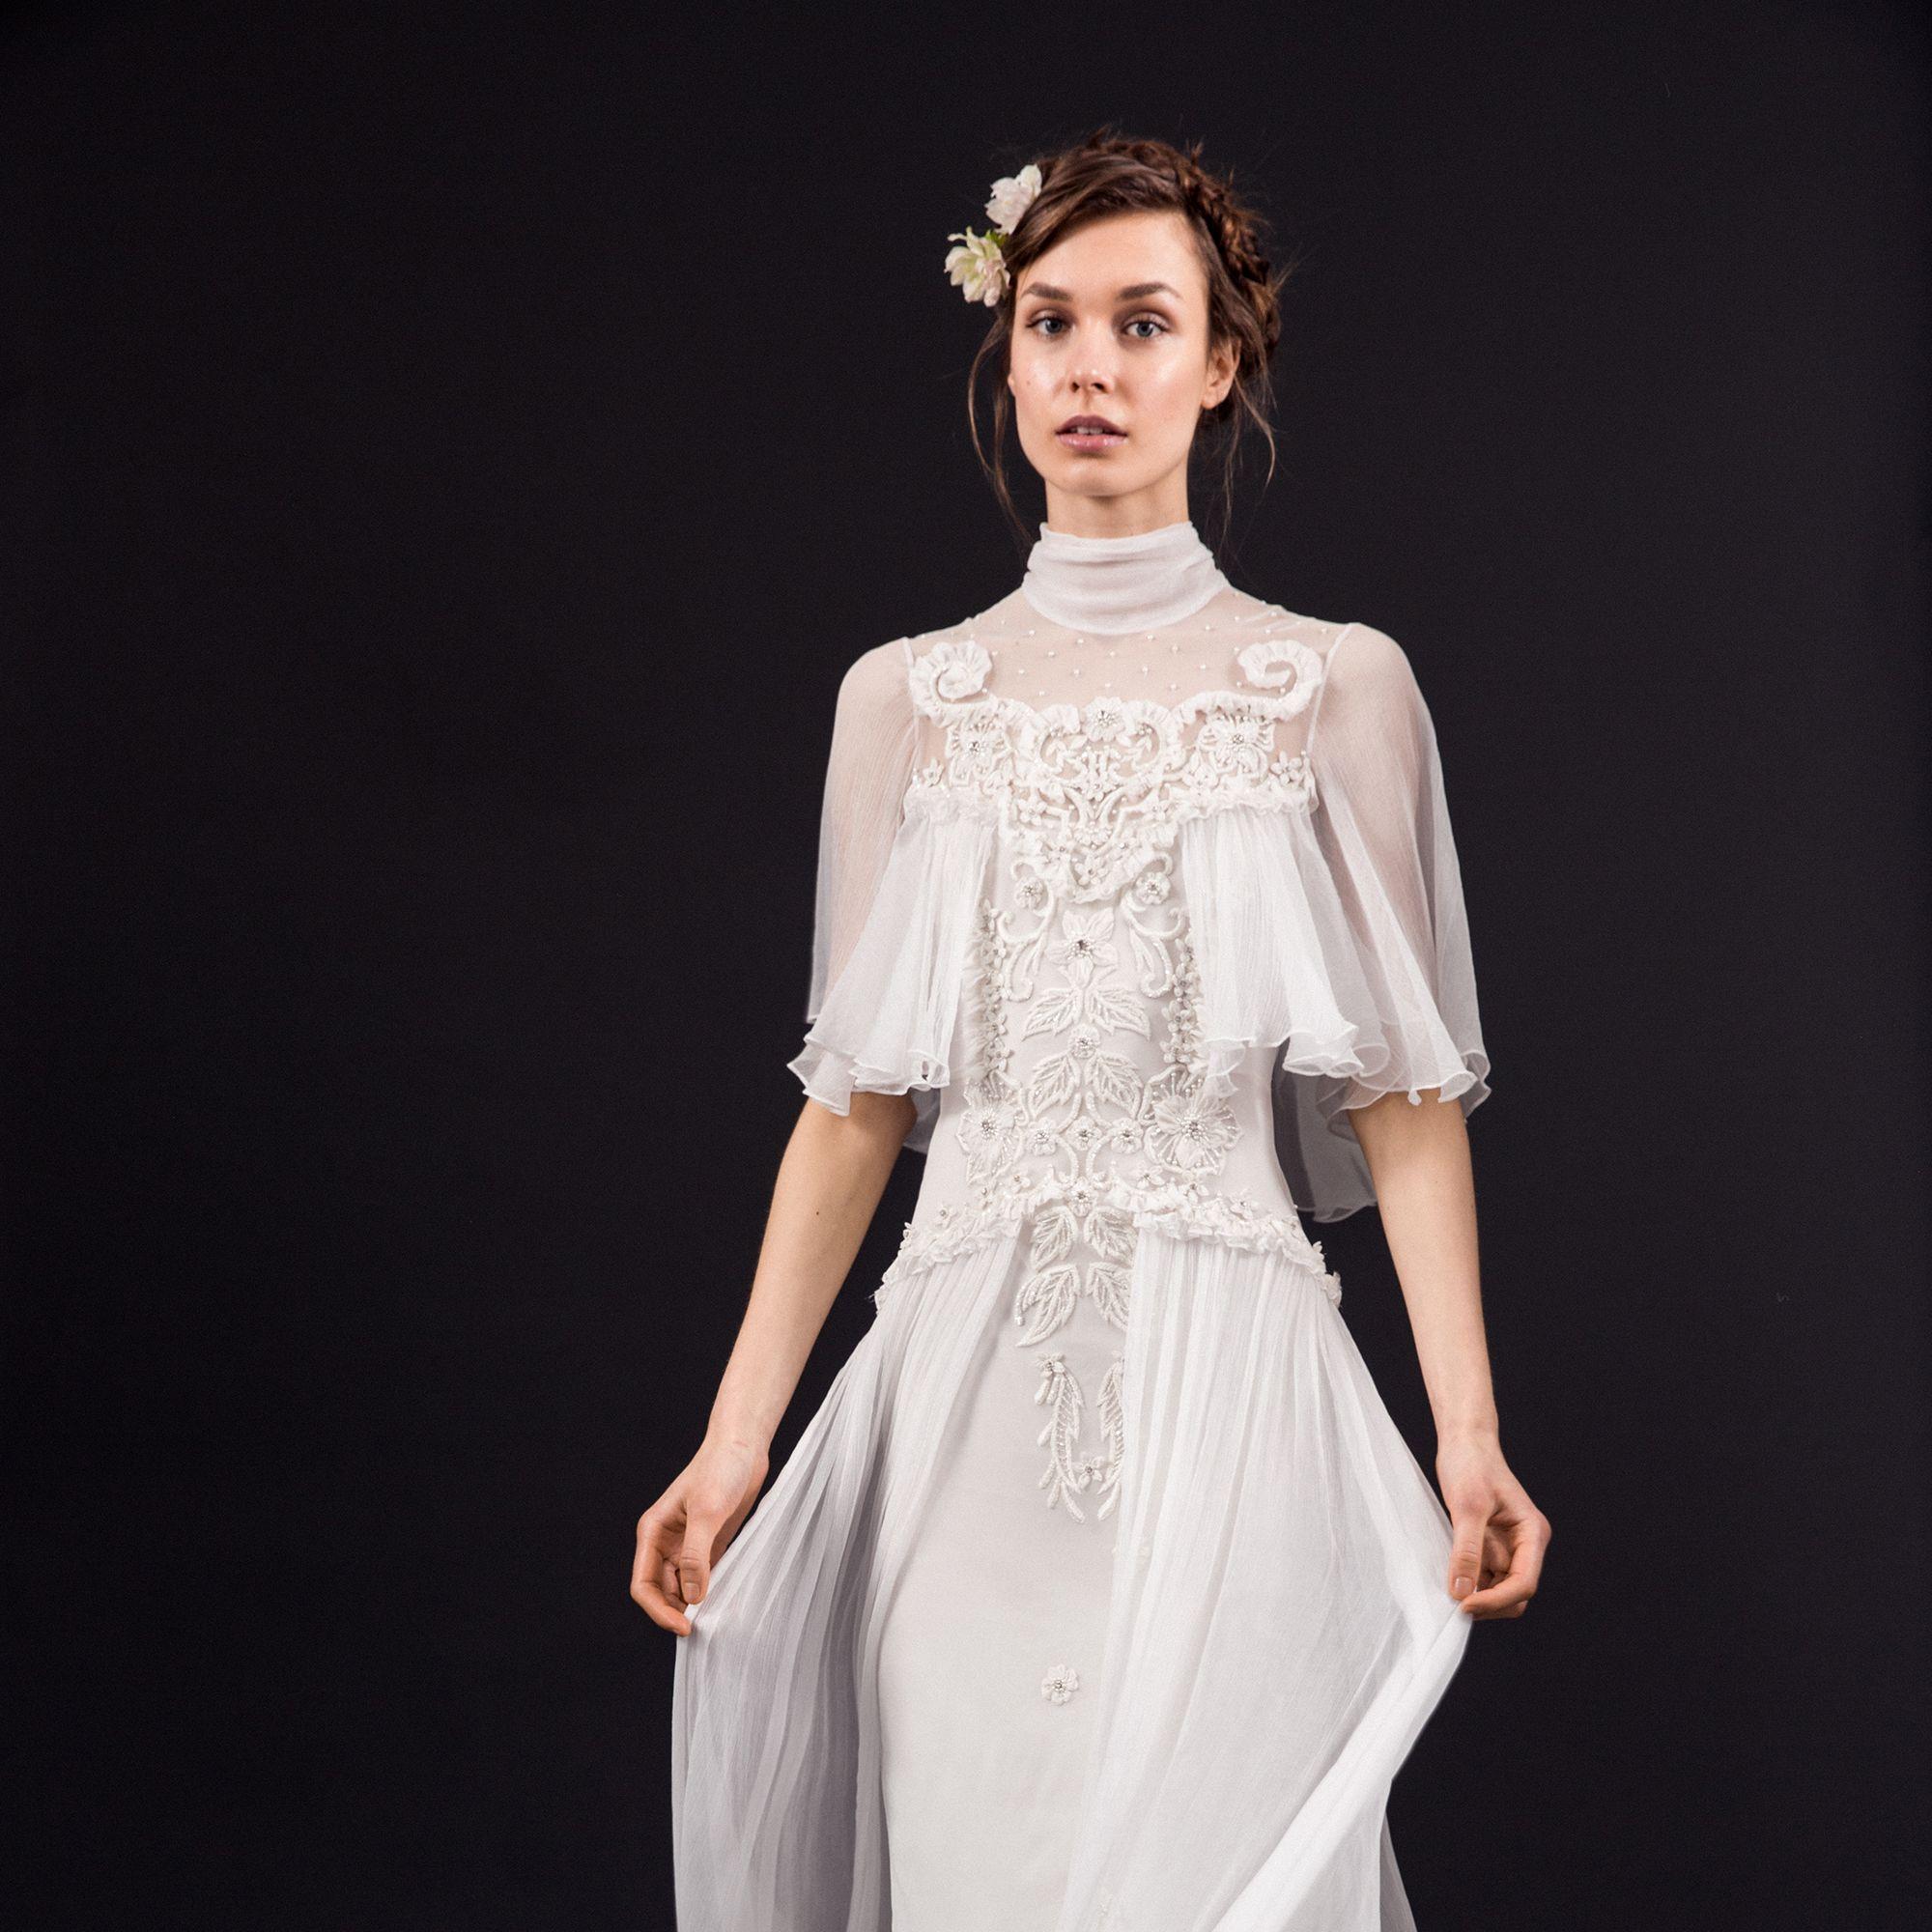 "<p>""Rowena"" gown, $4,850, <a href=""http://rams.harpersbazaar.com/temperleylondon.com"" target=""_blank"">temperleylondon.com</a>.</p>"